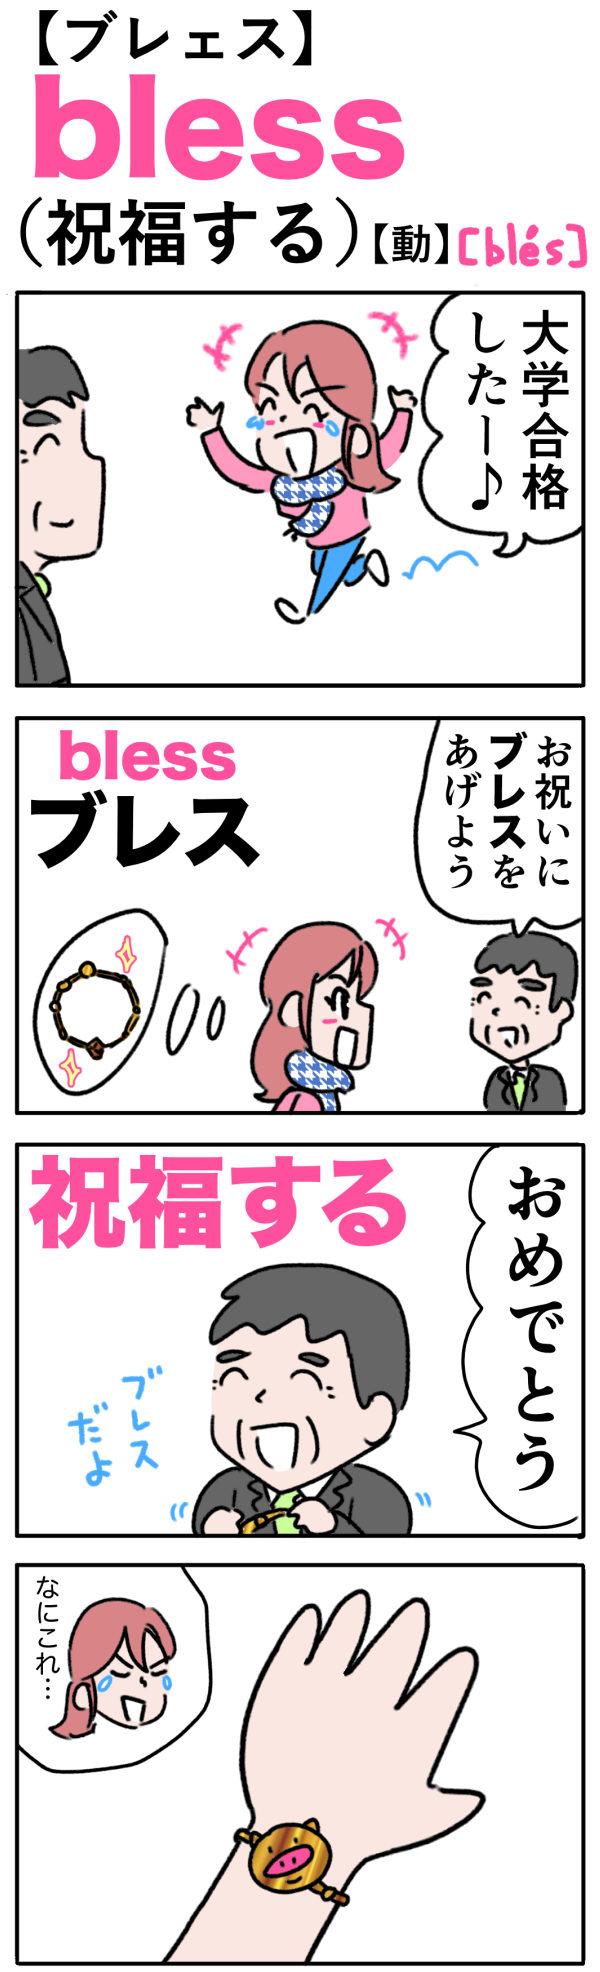 bless(祝福する)の語呂合わせ英単語